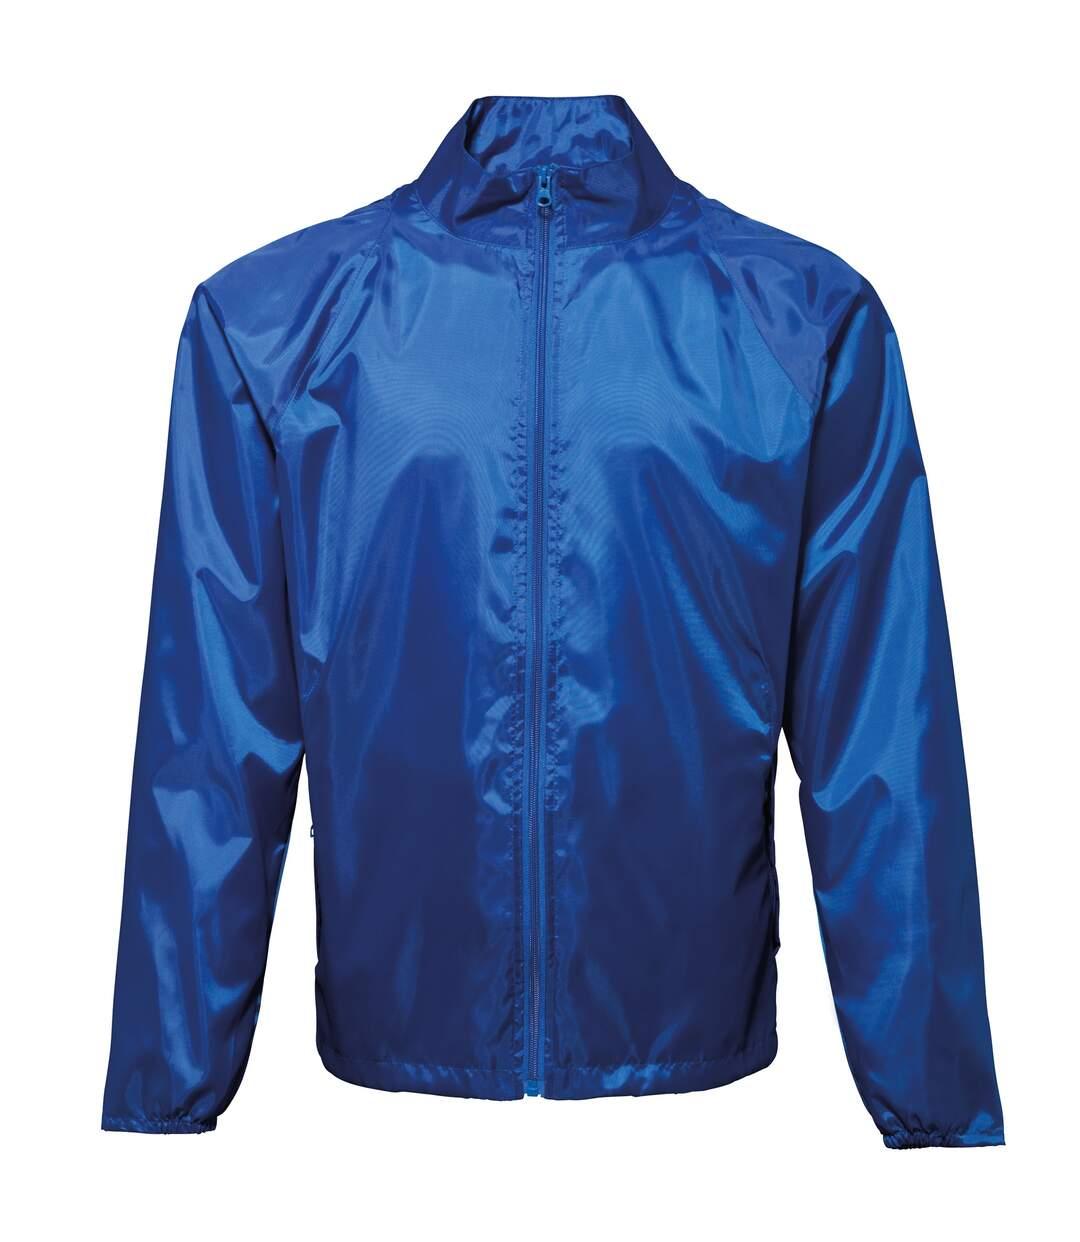 2786 Unisex Lightweight Plain Wind & Shower Resistant Jacket (Yellow) - UTRW2500